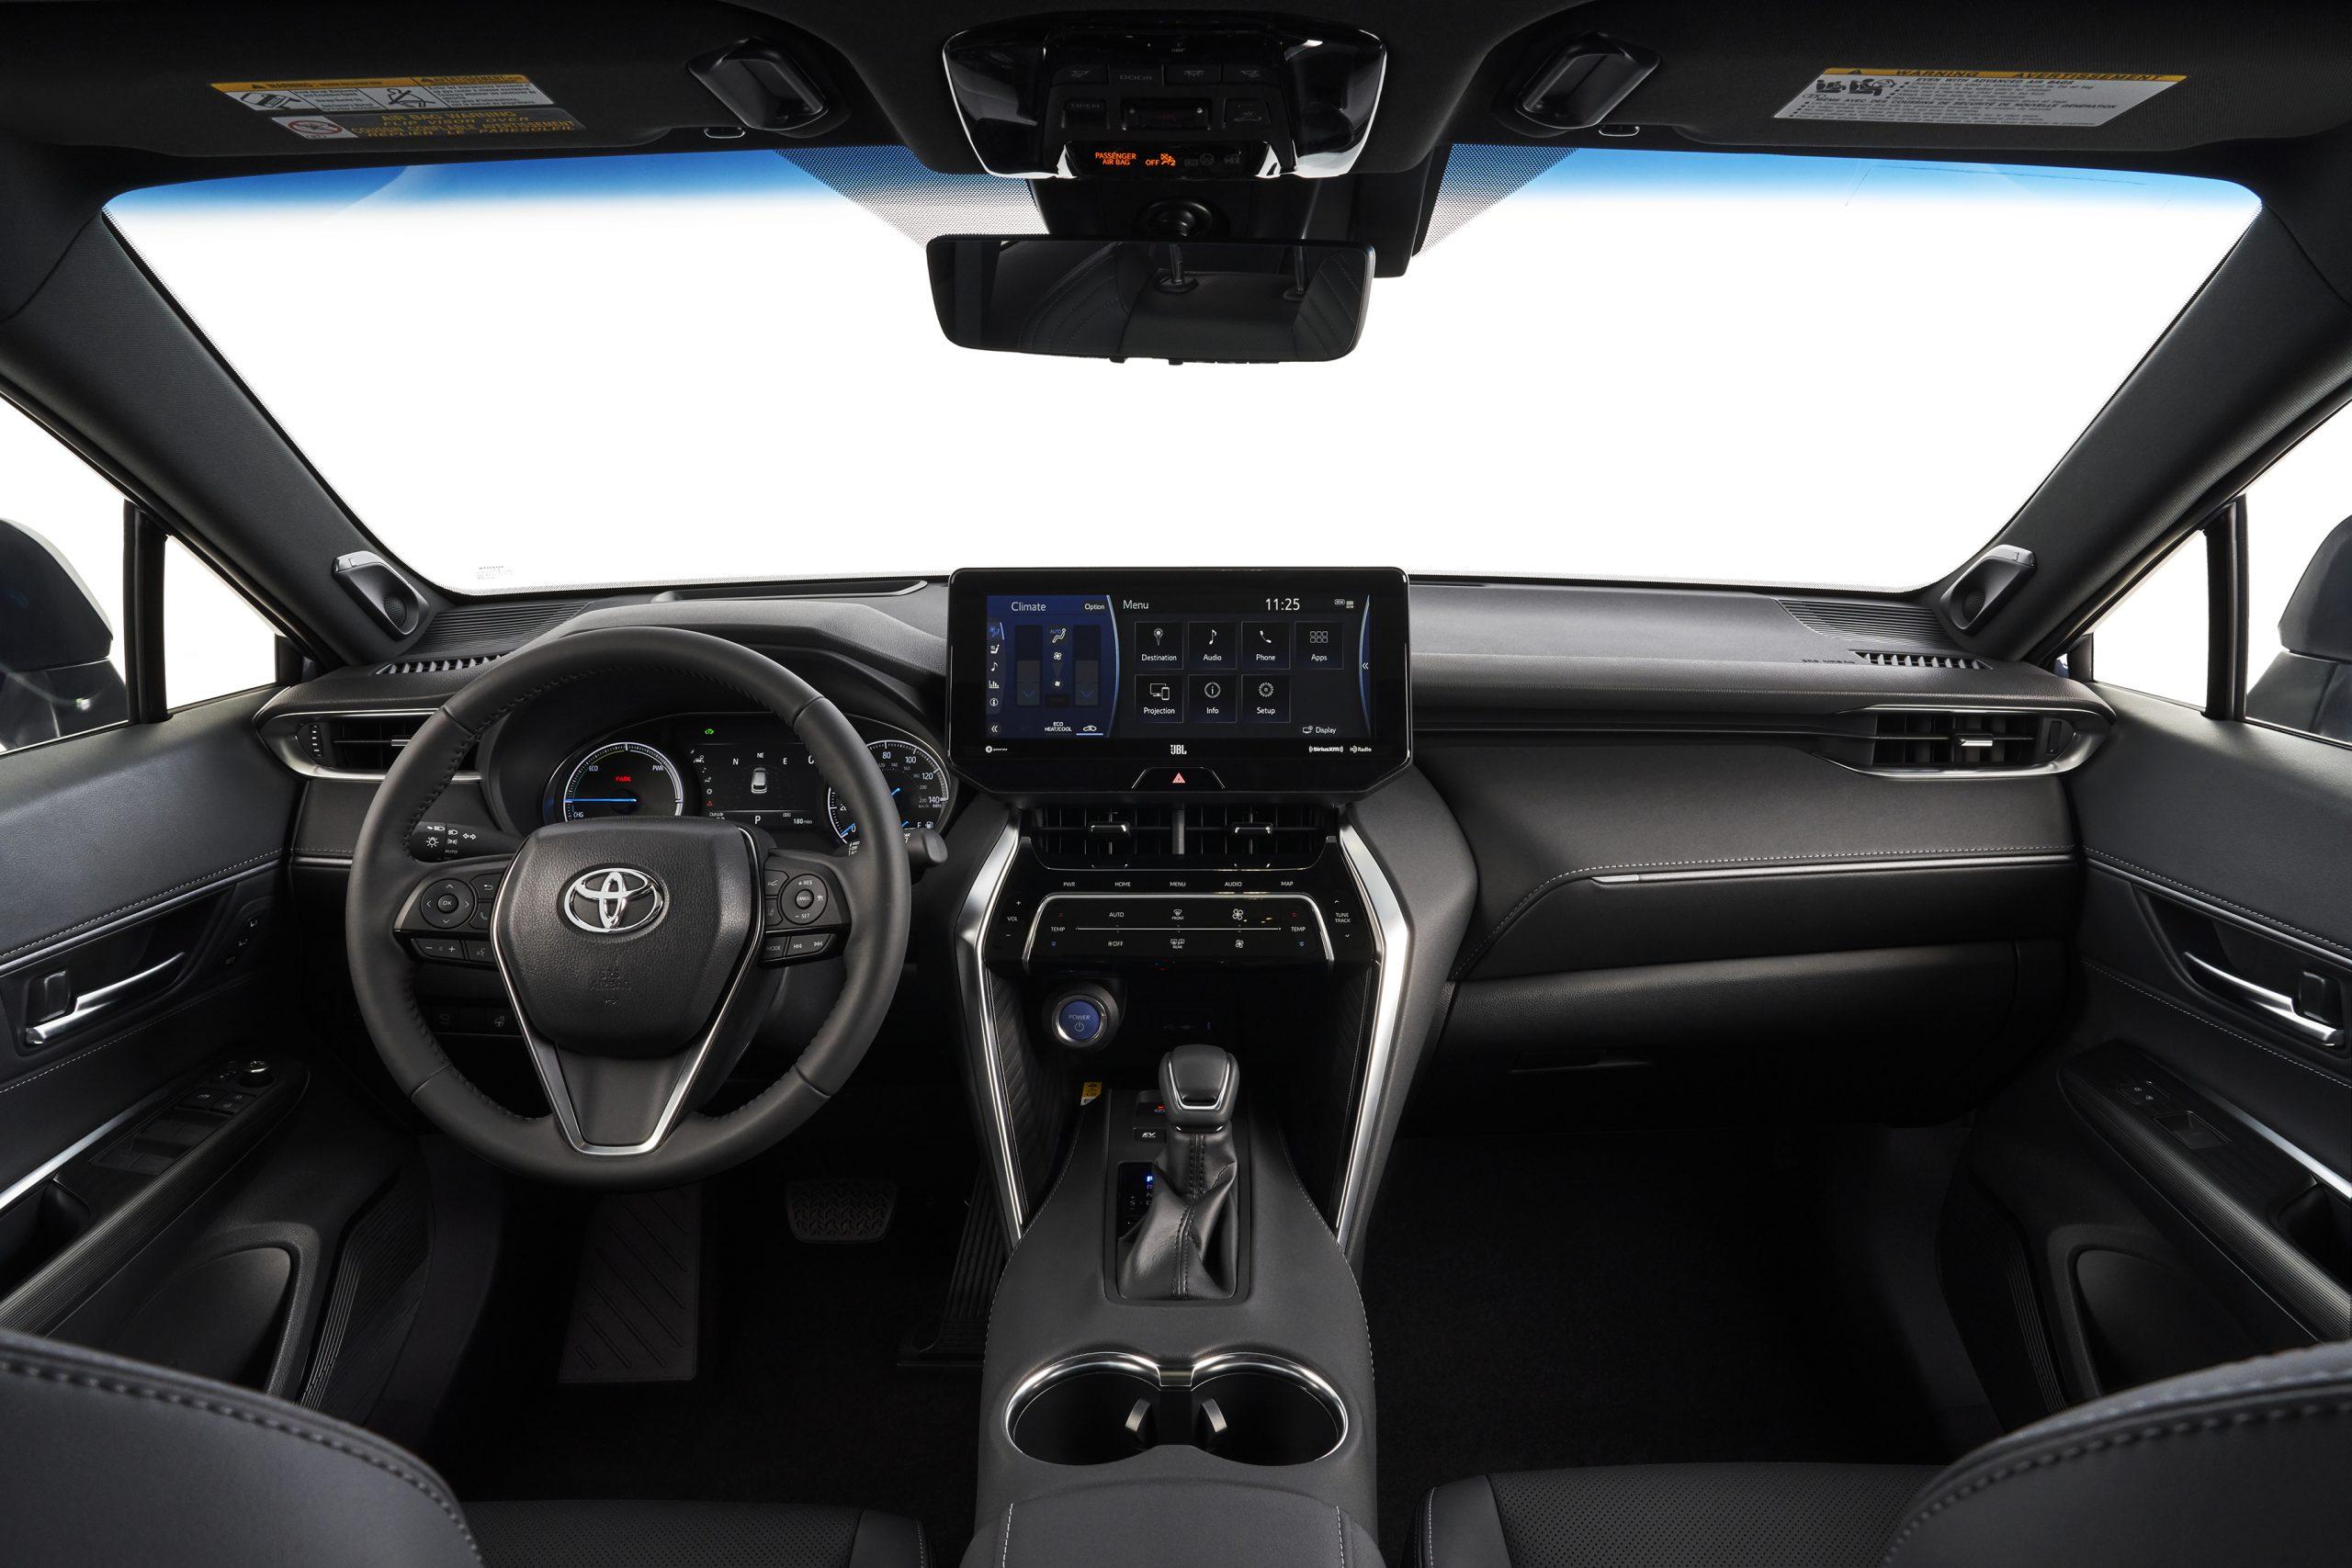 2021-Toyota-Venza_Interior_016-scaled.jpg